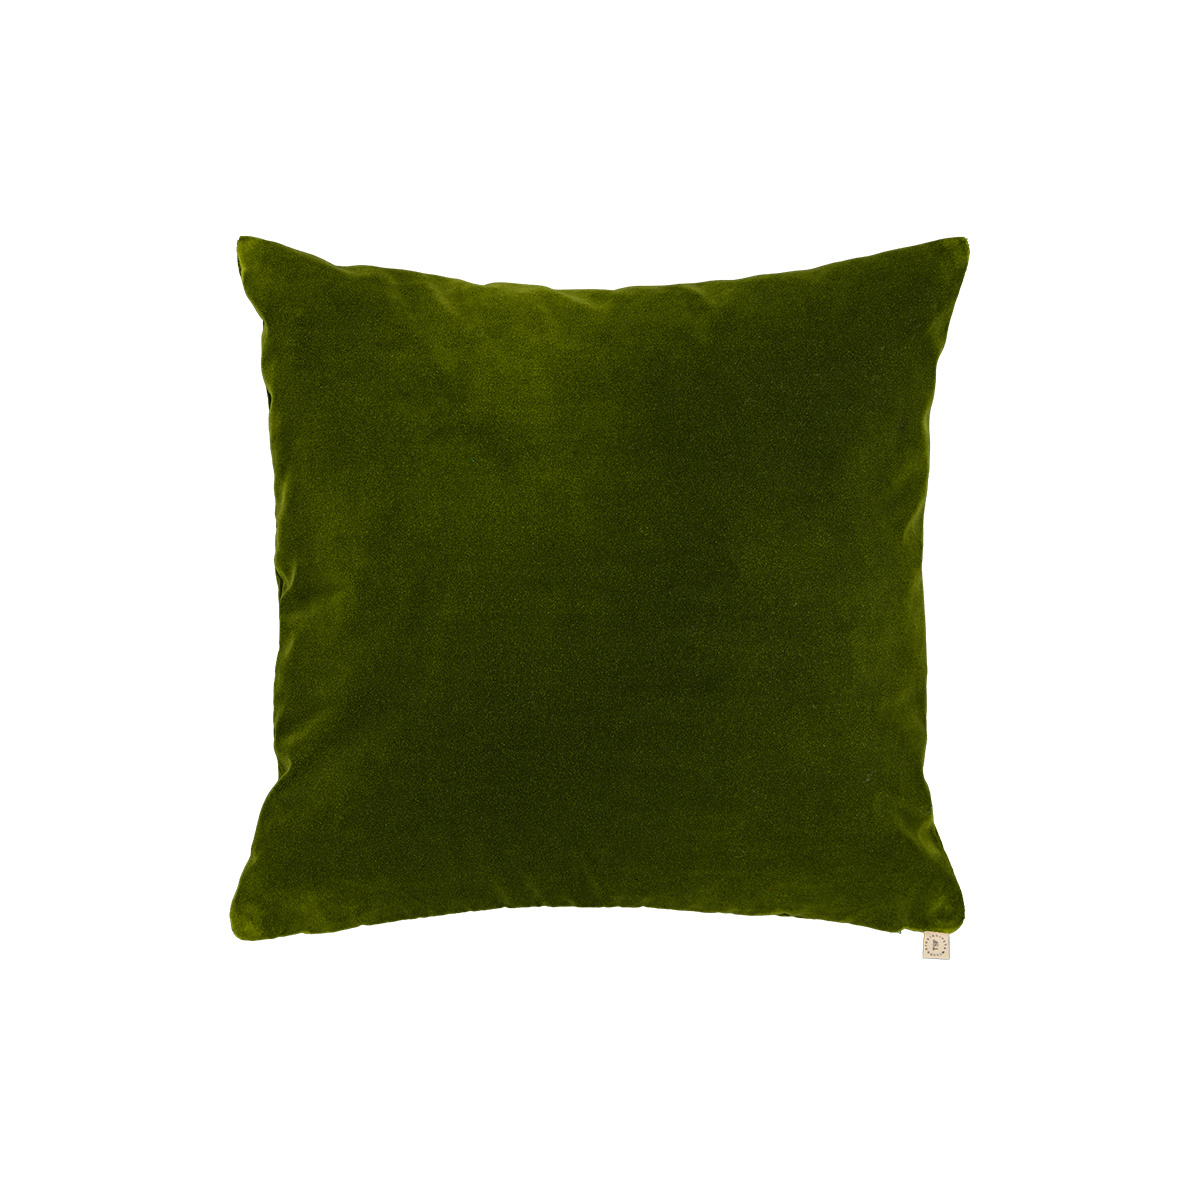 Coussin Nonna velours vert sapin